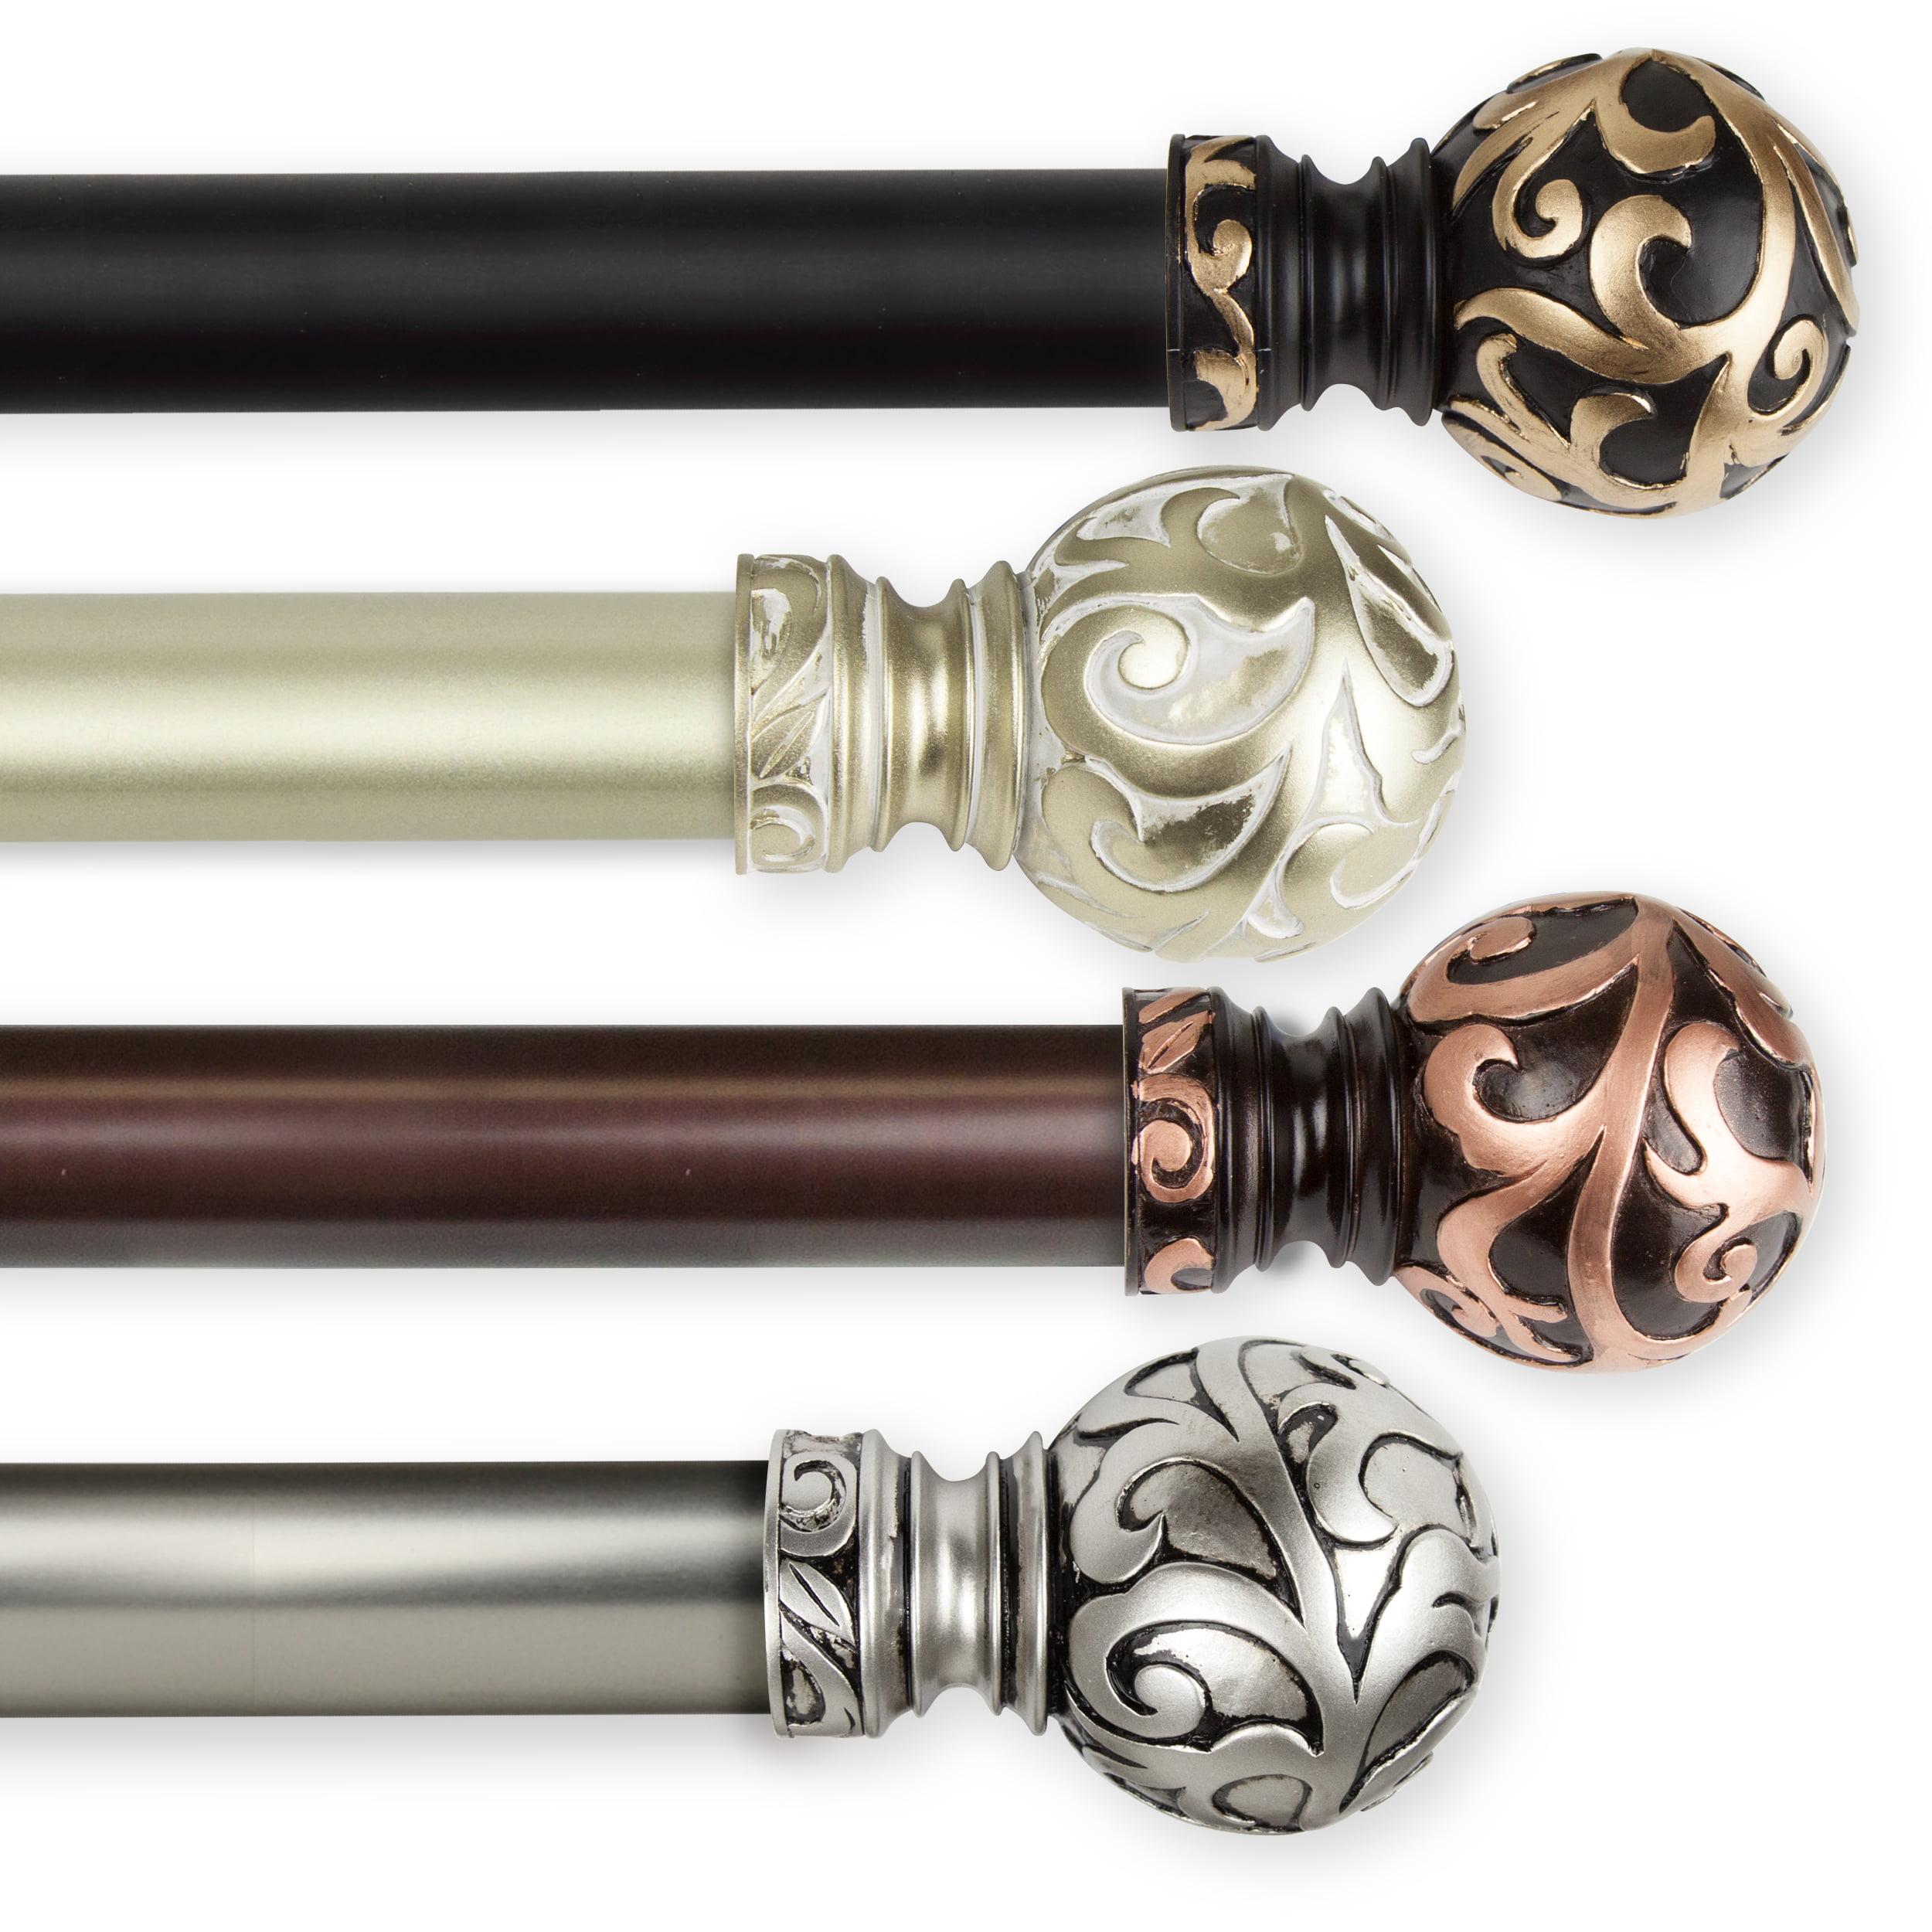 "Cypress 1"" dia. Curtain Rod 160-240 inch - Black"